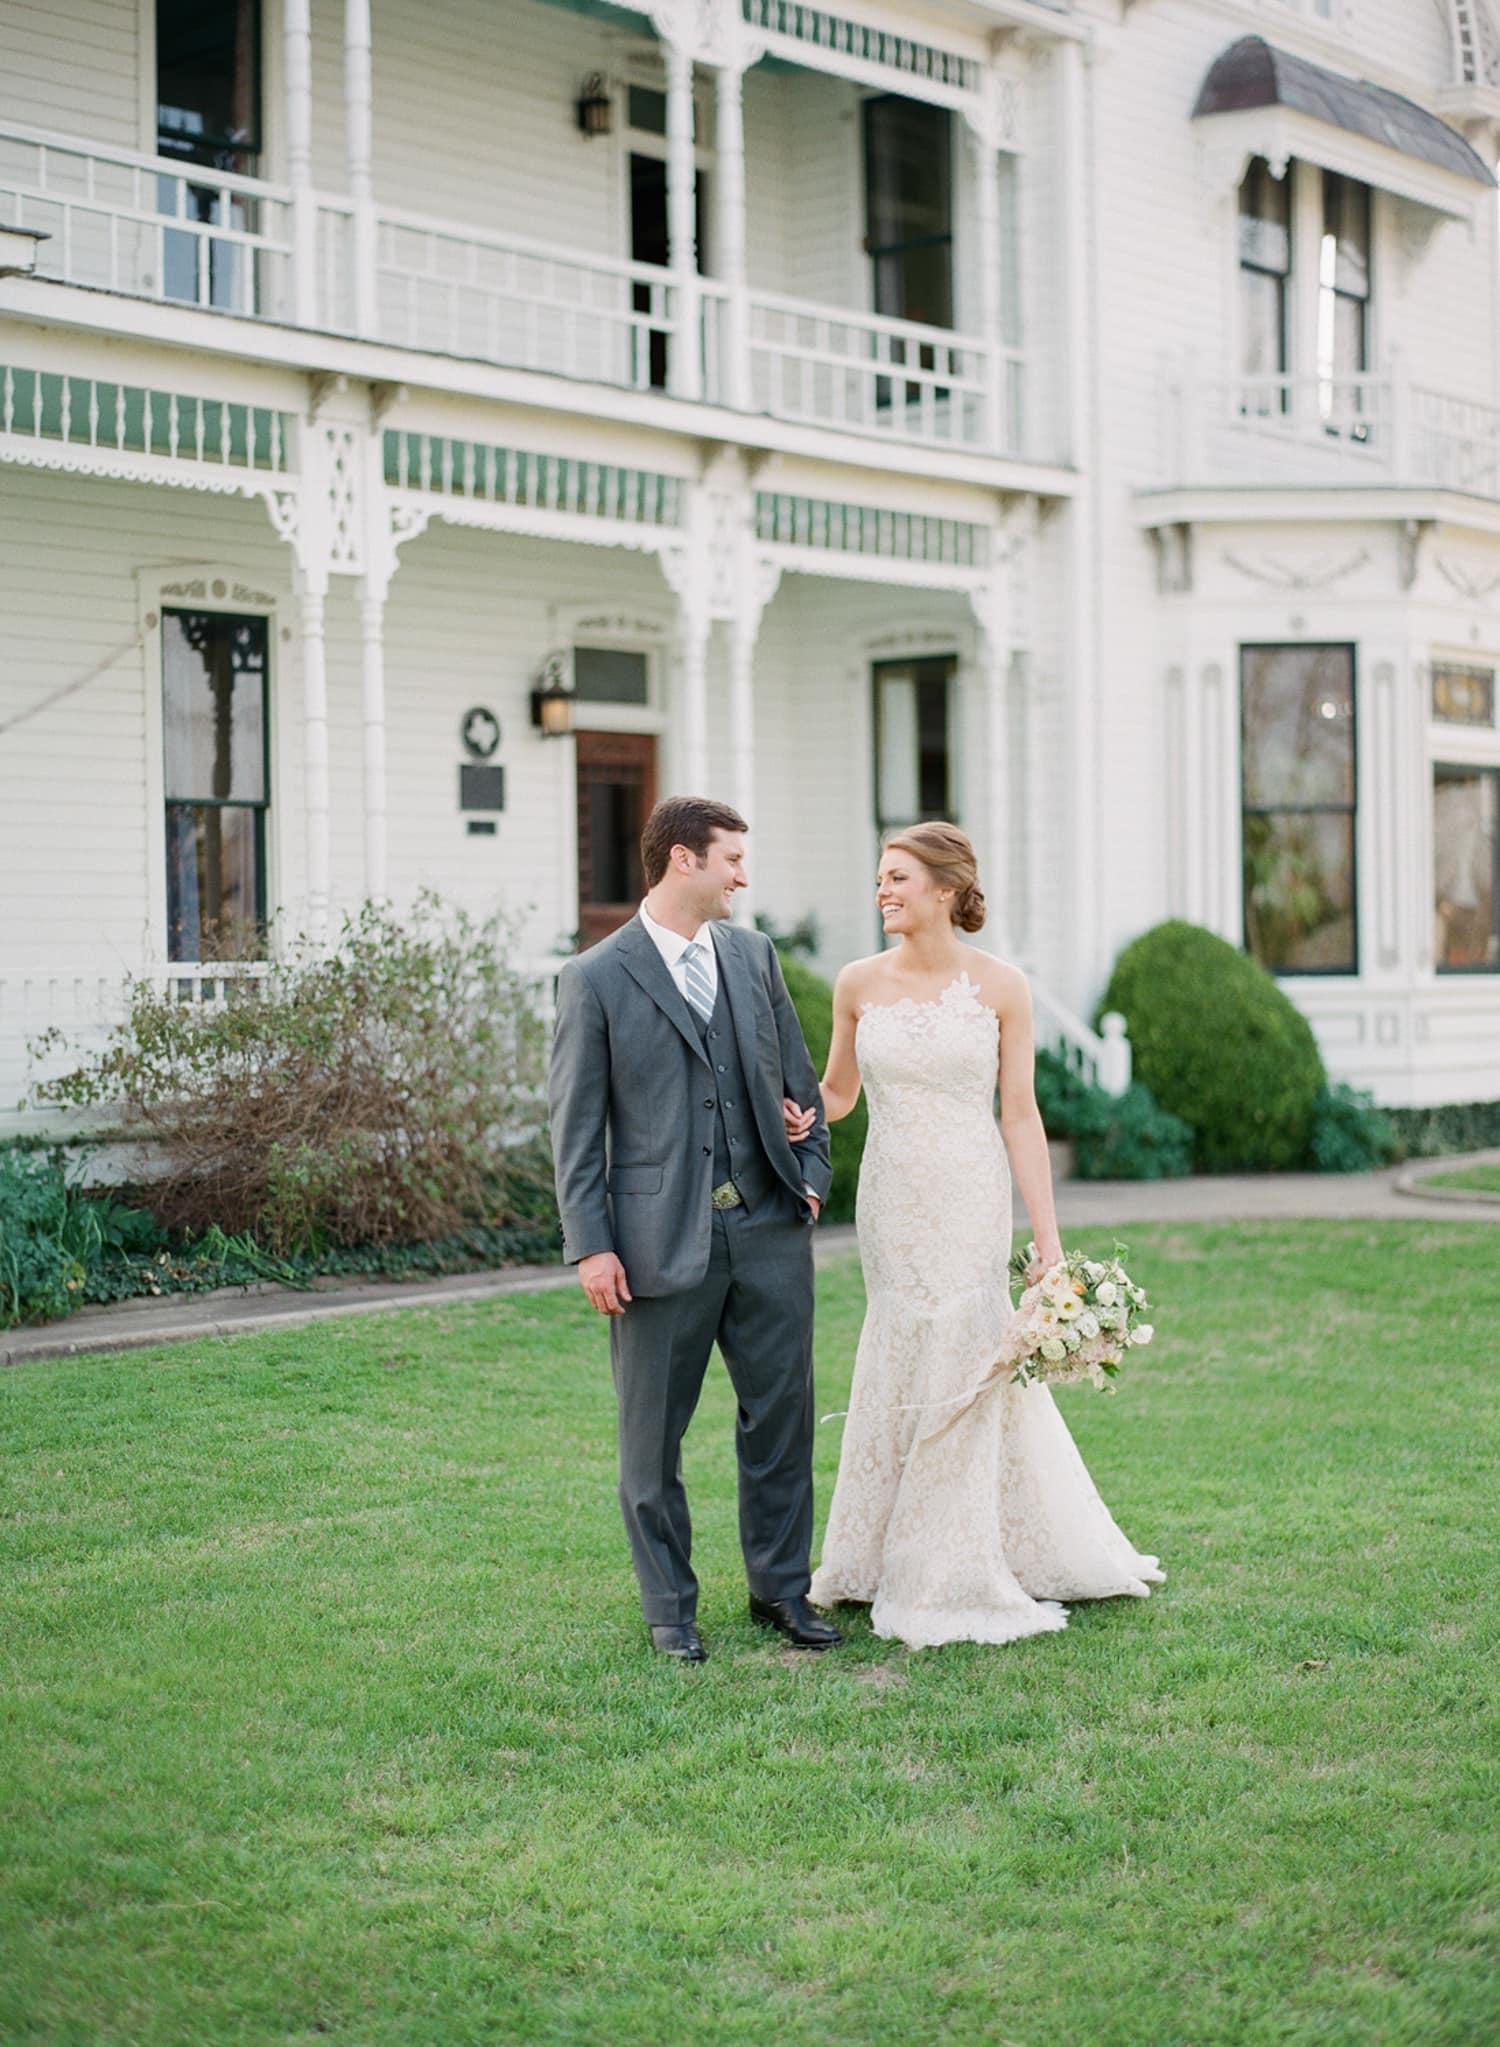 barr-mansion-wedding-41.jpg